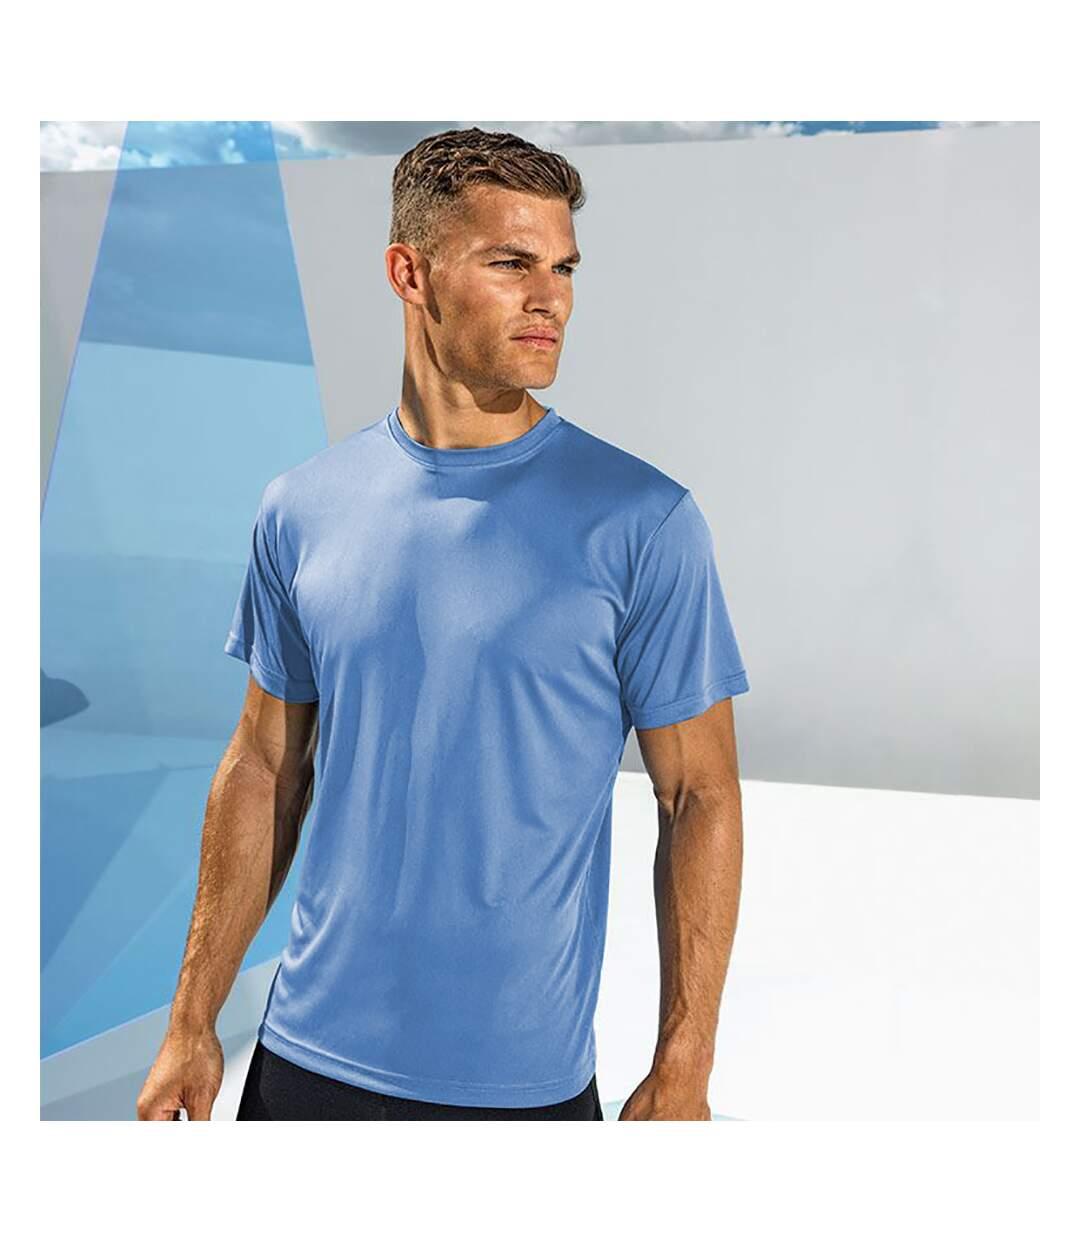 Tri Dri Mens Short Sleeve Lightweight Fitness T-Shirt (Cornflower) - UTRW4798